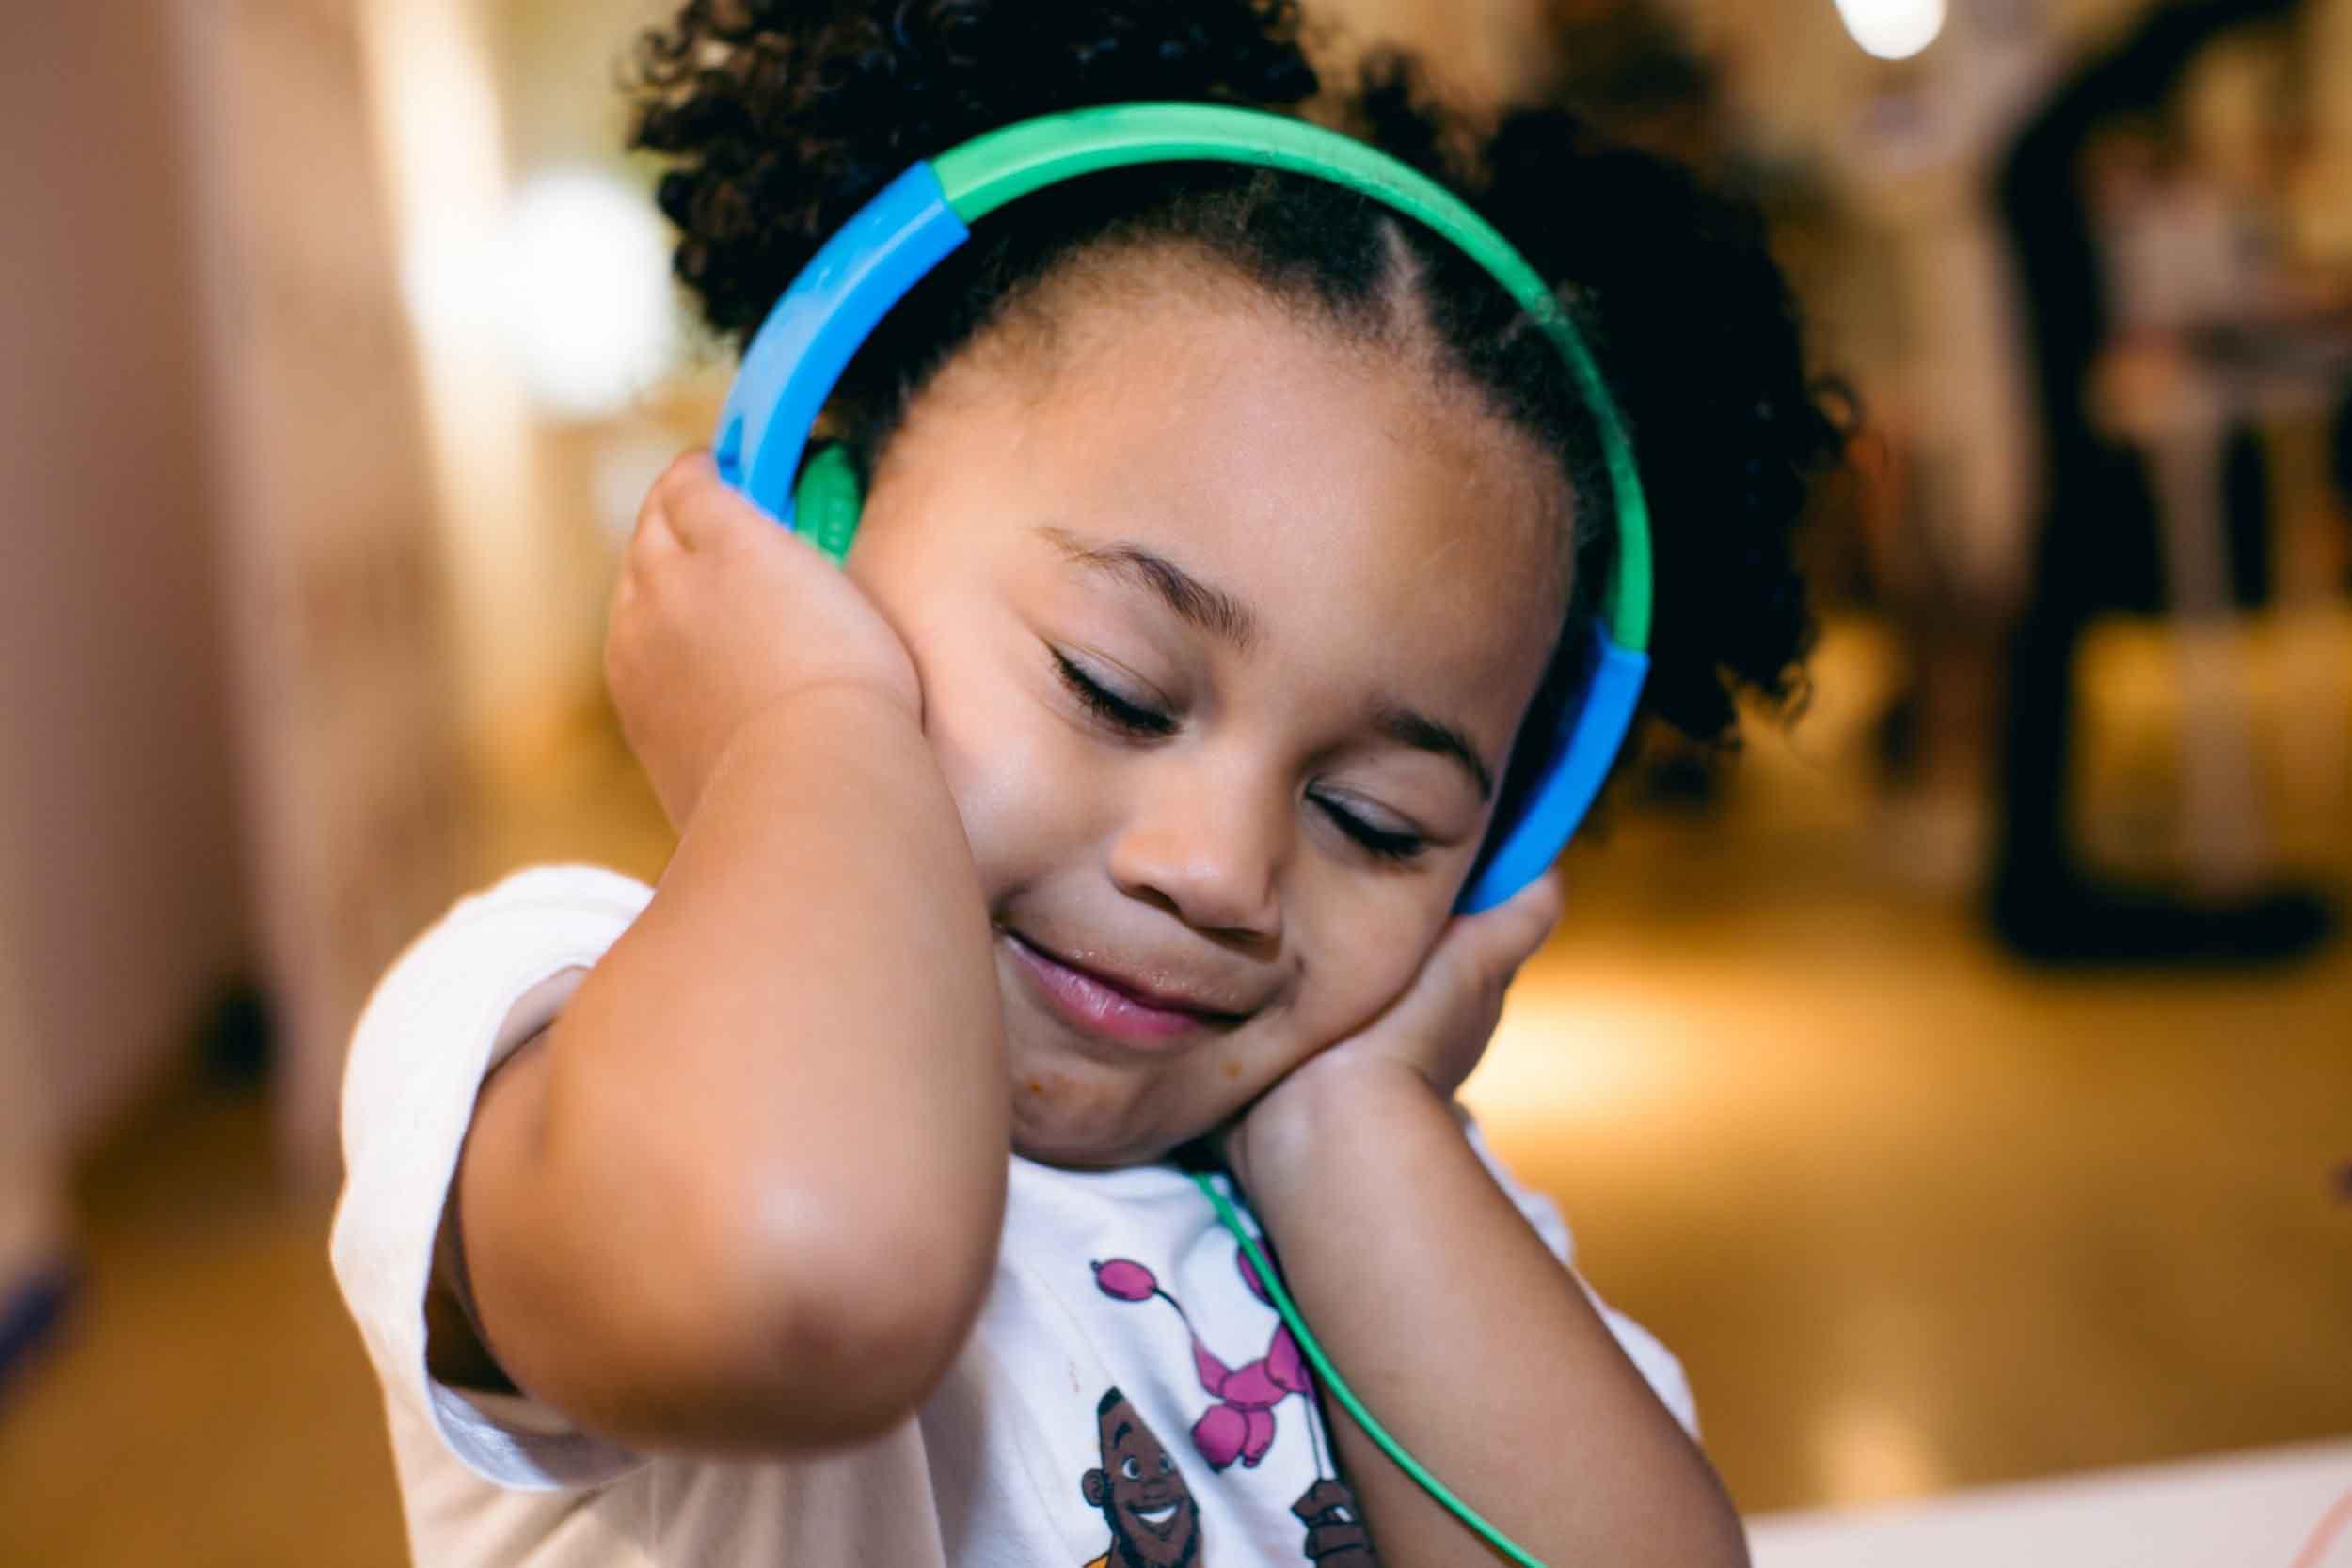 Listening Music 1 دانستنی موسیقی و نکات جالب موسیقایی